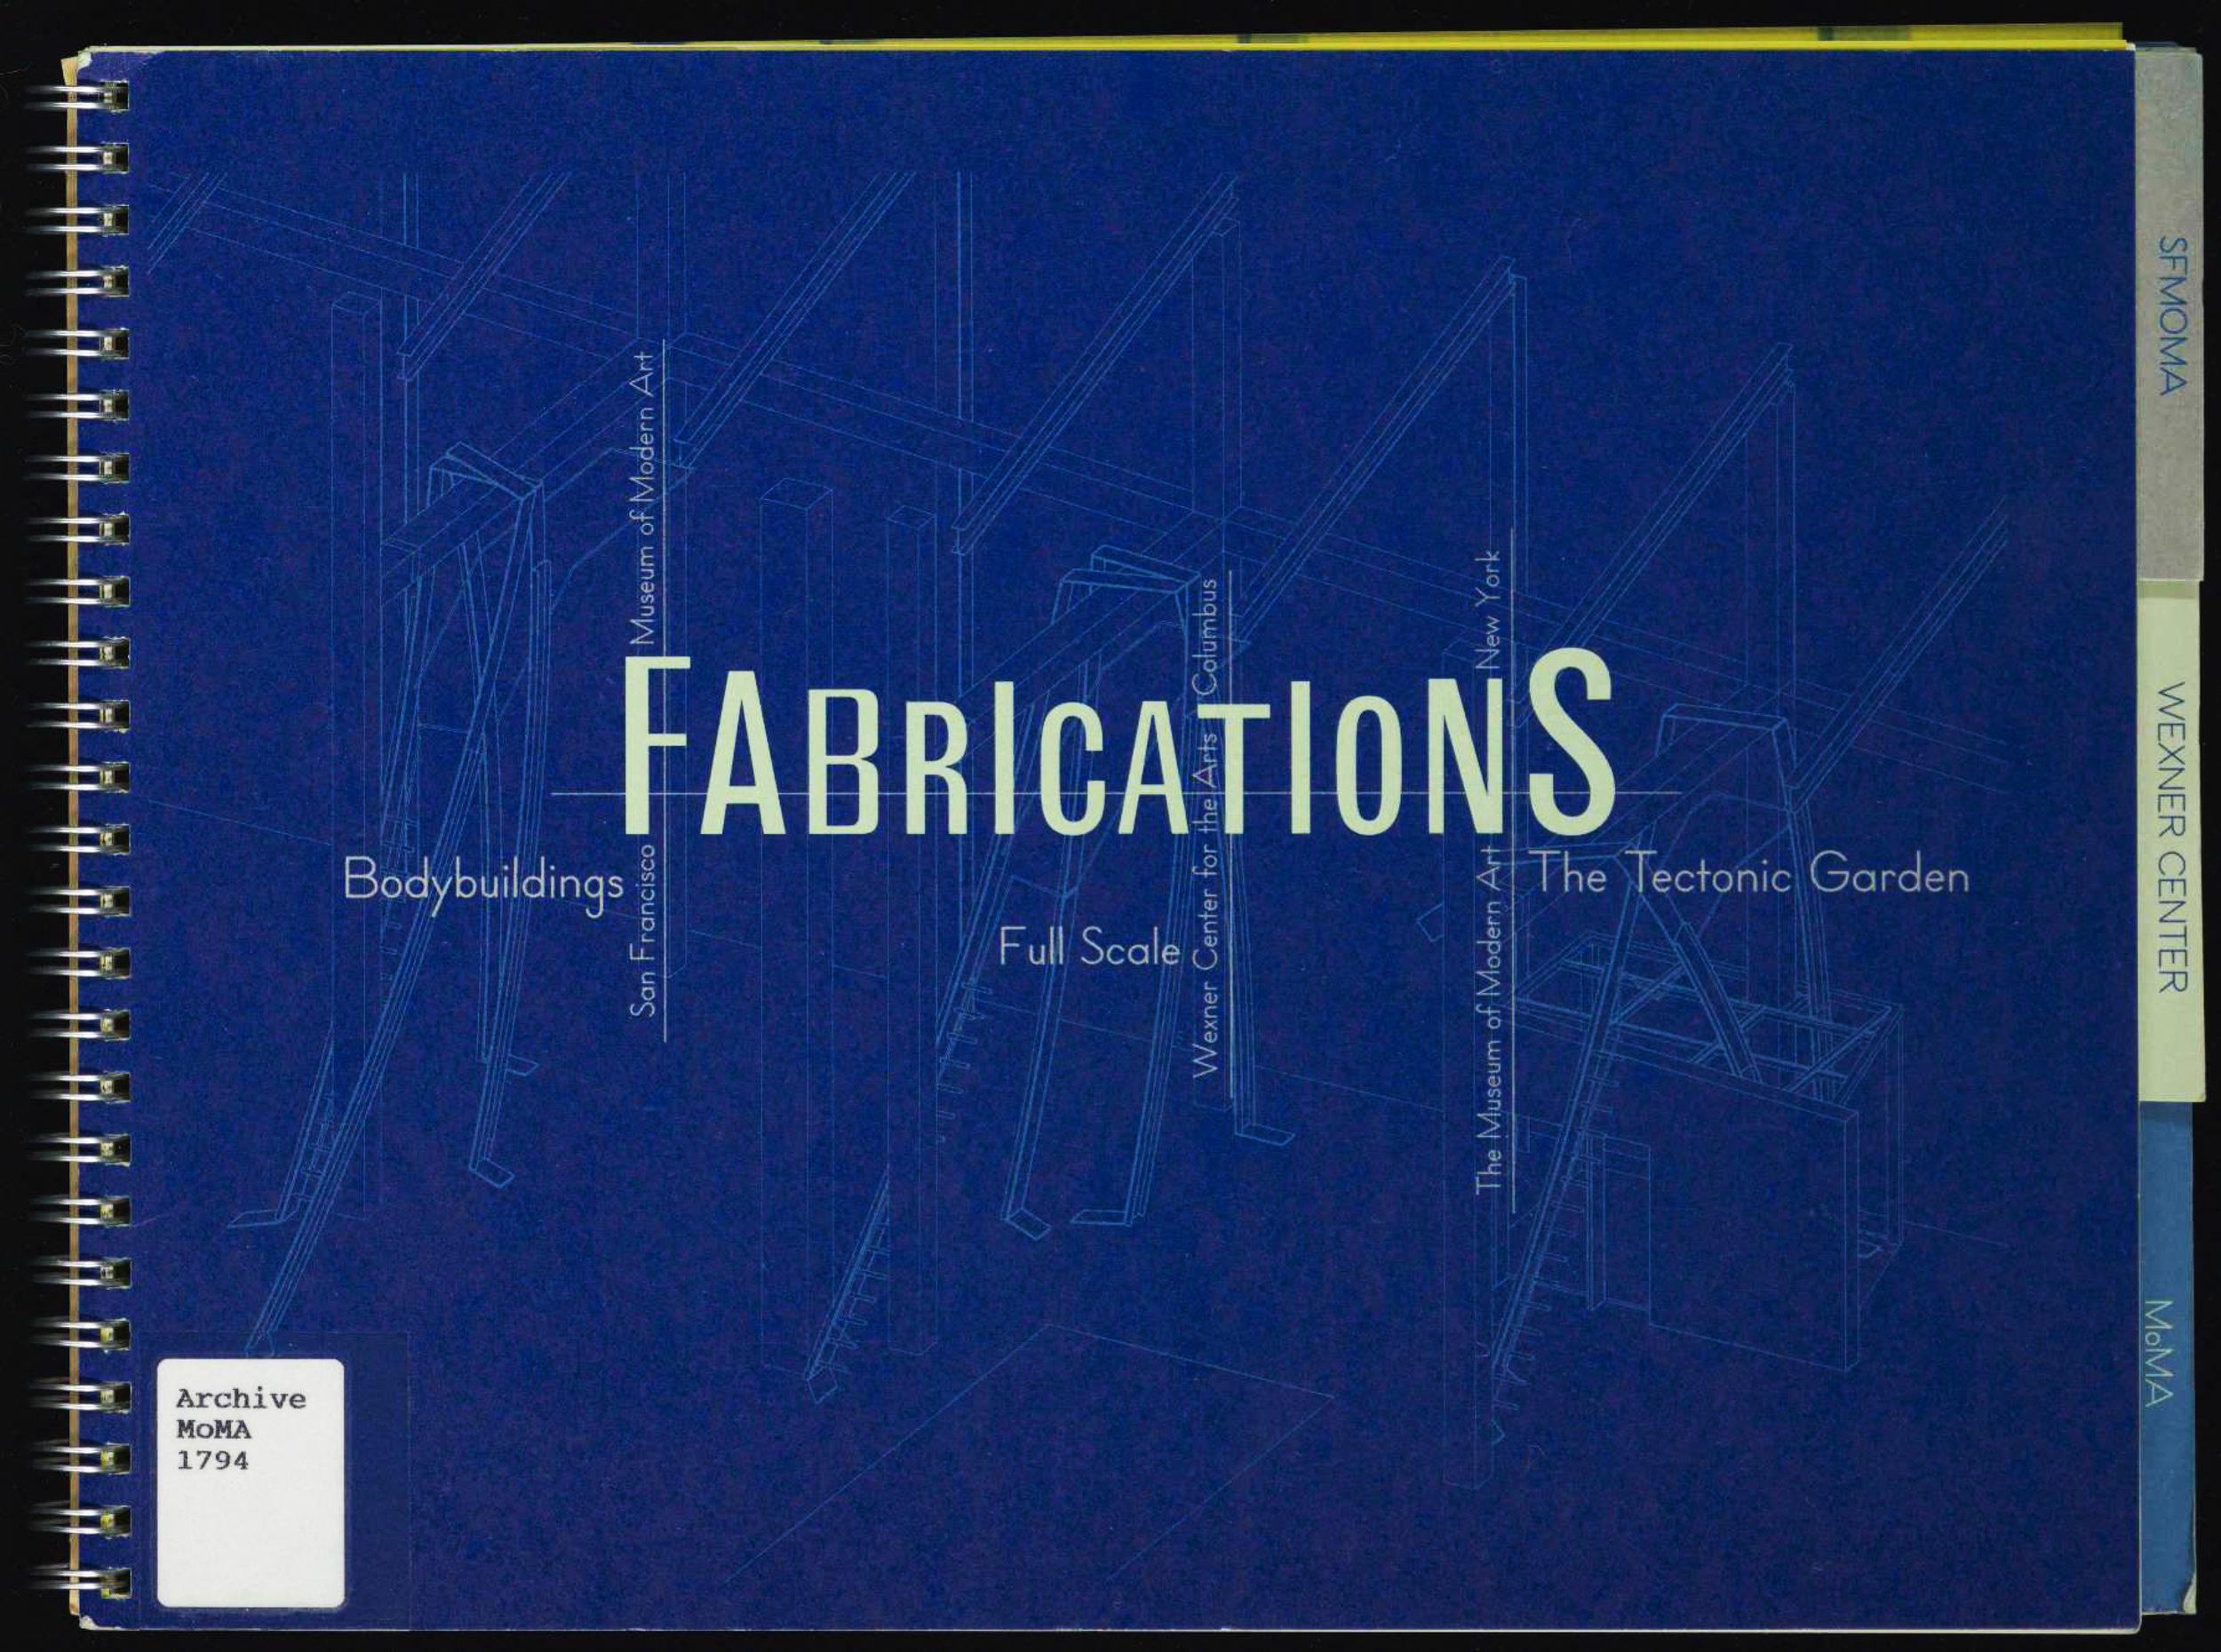 MoMa Fabrications - PDF